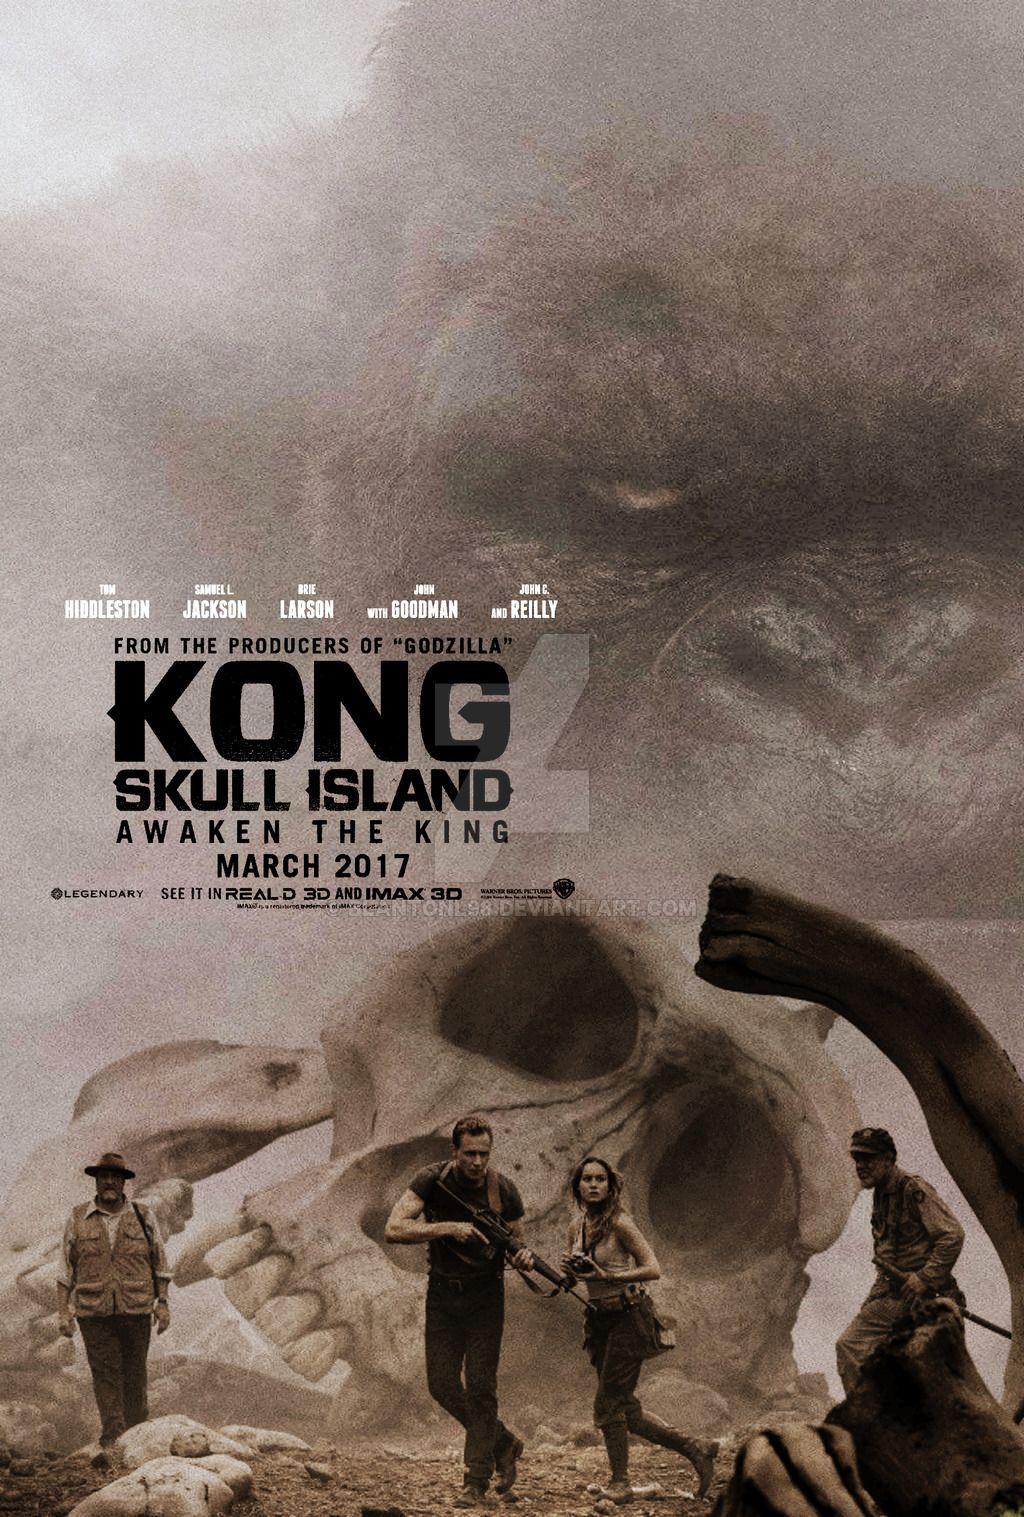 Kong Skull Island Movie Poster By Blantonl98 Http Blantonl98 Deviantart Com Art Kong Sk Kong Skull Island Movies Skull Island Movie King Kong Skull Island